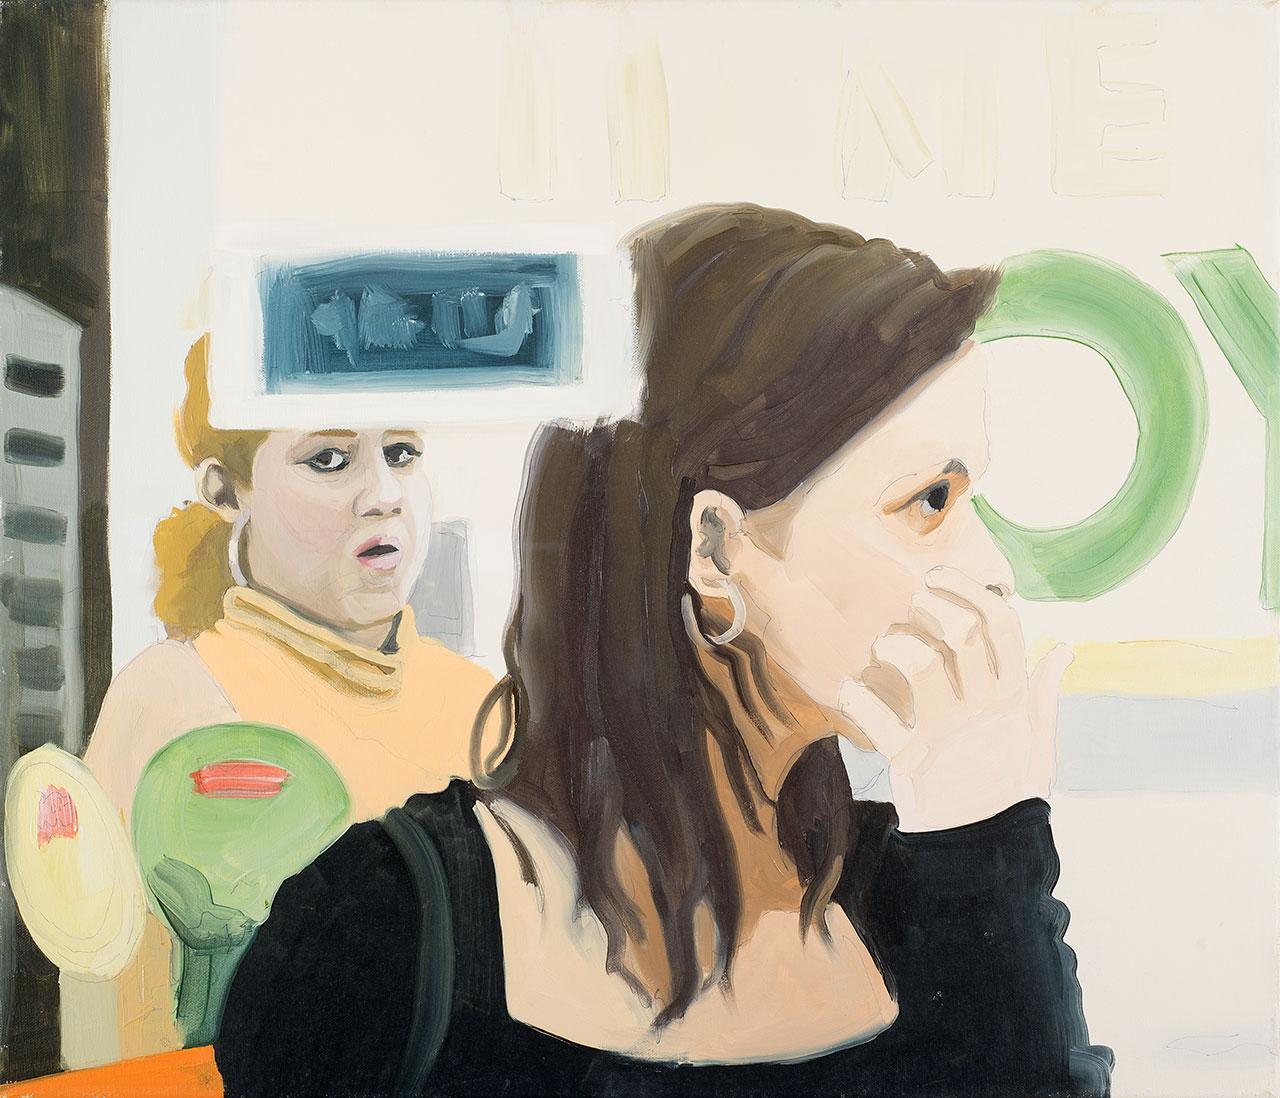 Homesickness (δύο κυρίες), 2006, ακρυλικό σε καμβά, 60x70 εκ.